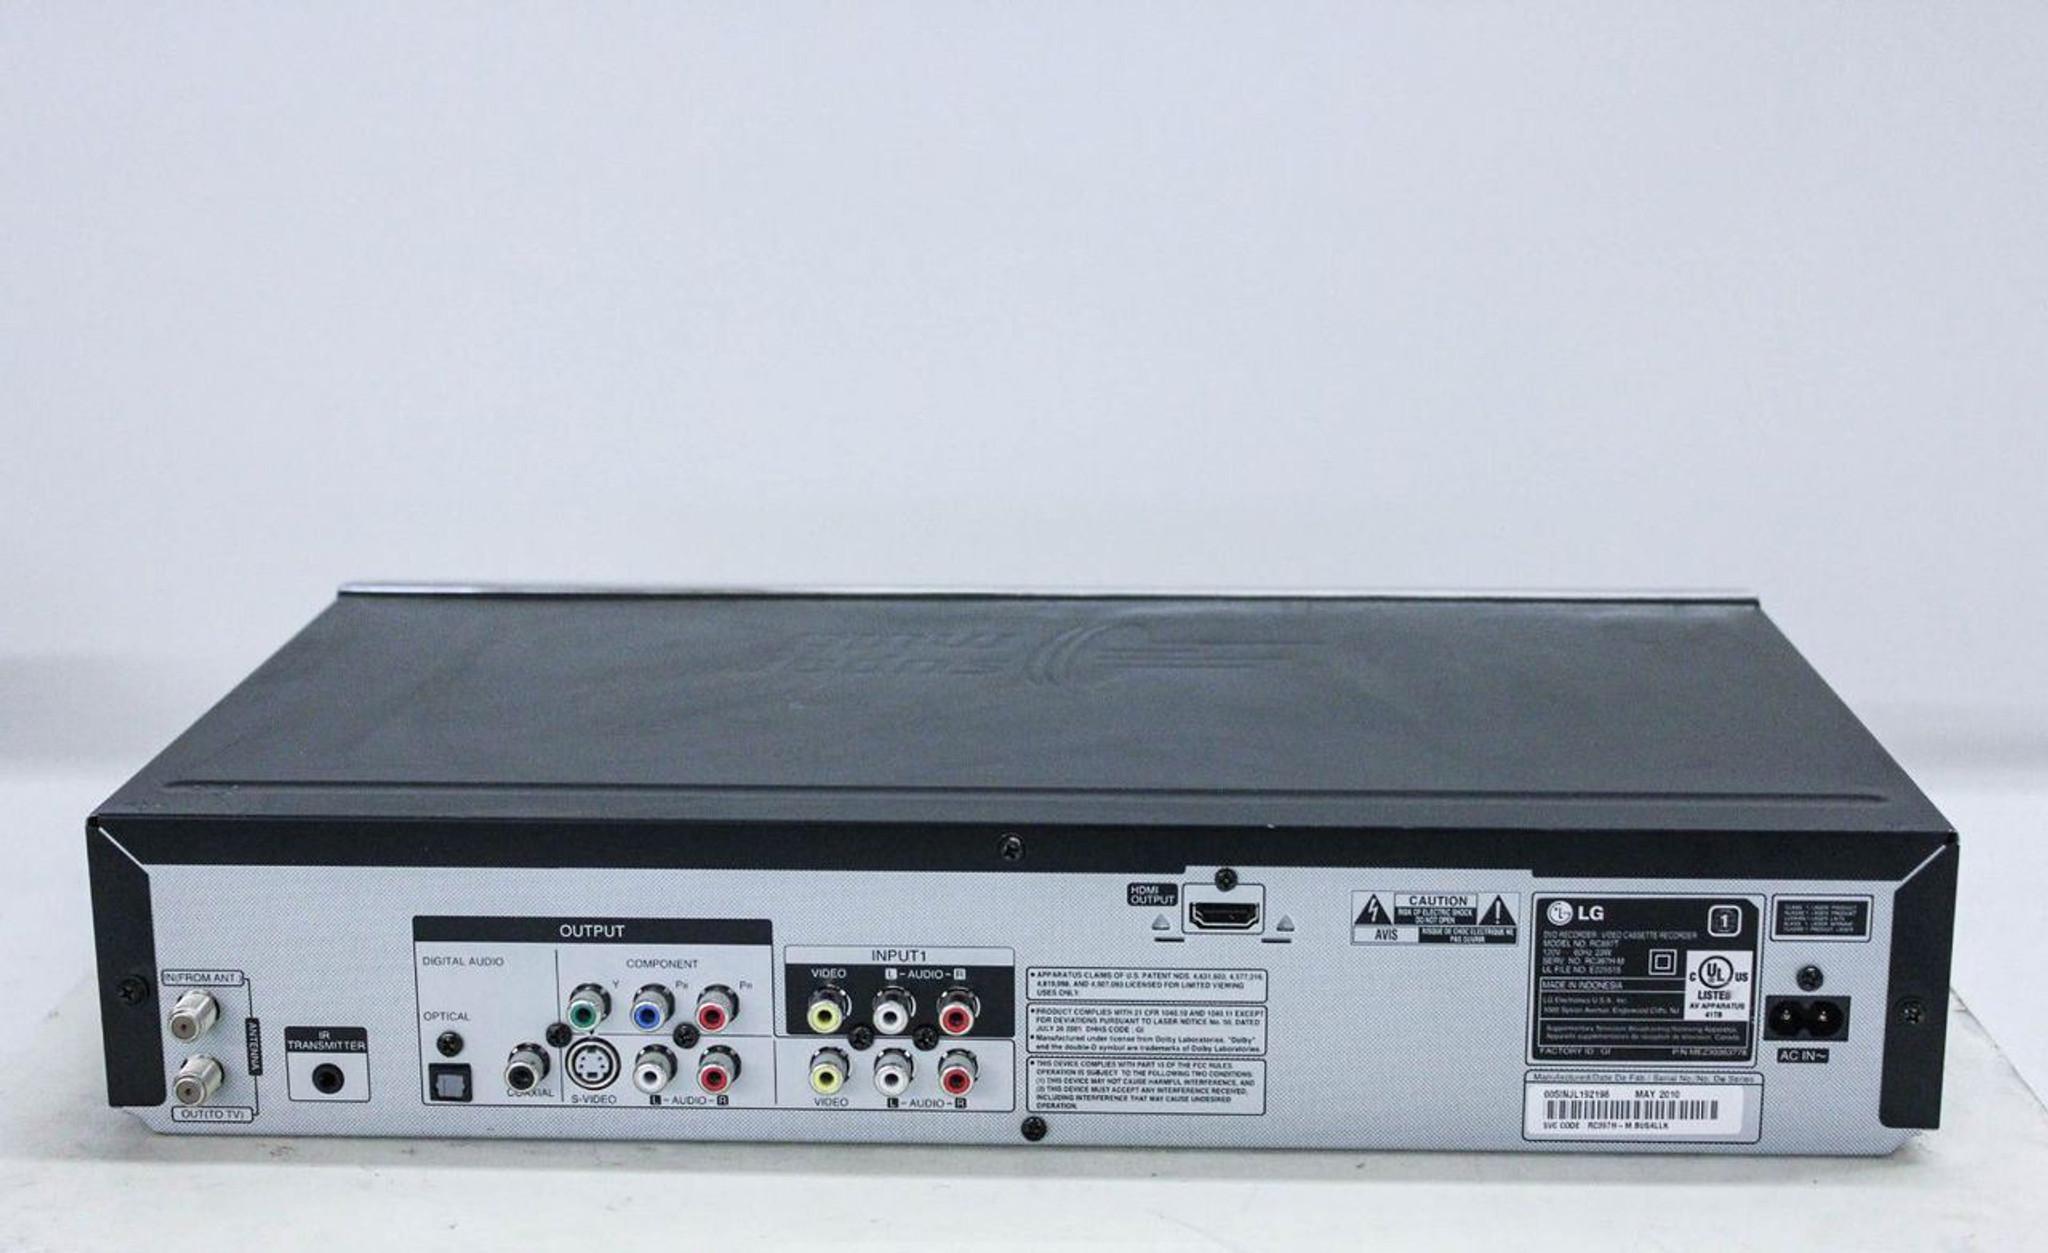 lg combo dvd vcr manual geometric series converges rh anr radio mobile tk lg rc199h dvd recorder vcr combo manual lg rc185 dvd recorder vcr combo manual